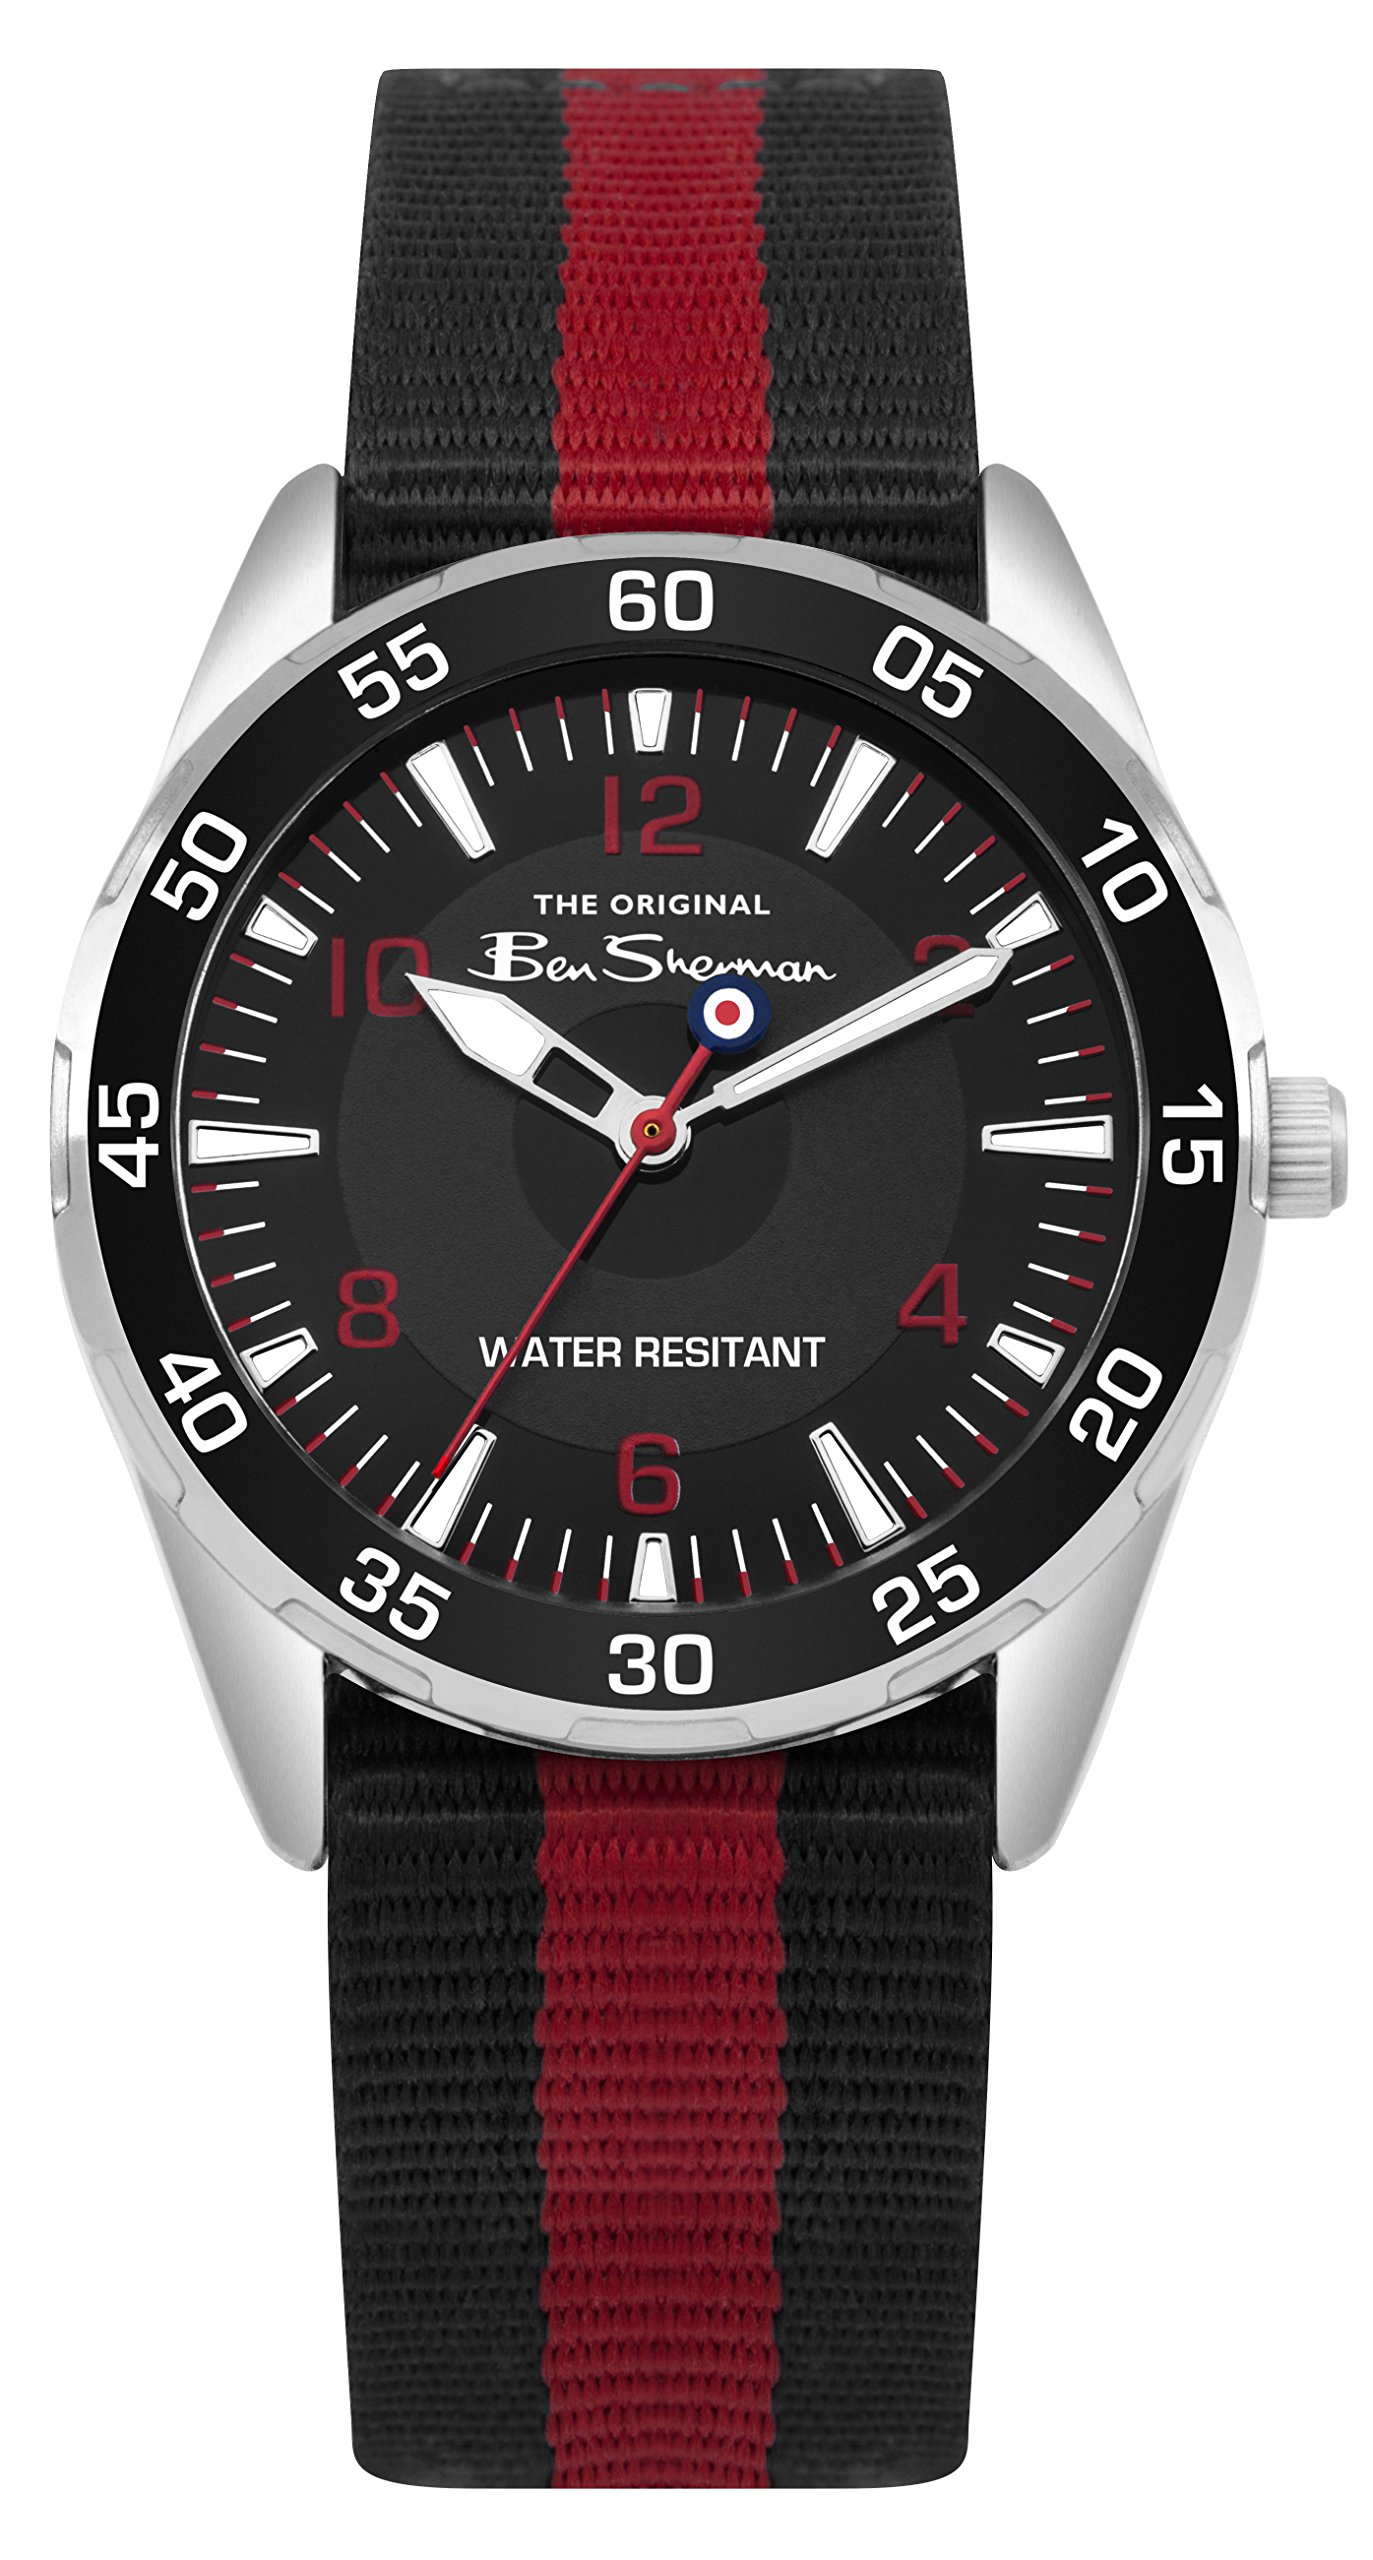 Ben Sherman Boys Analogue Quartz Watch with Nylon Strap BSK003RB G